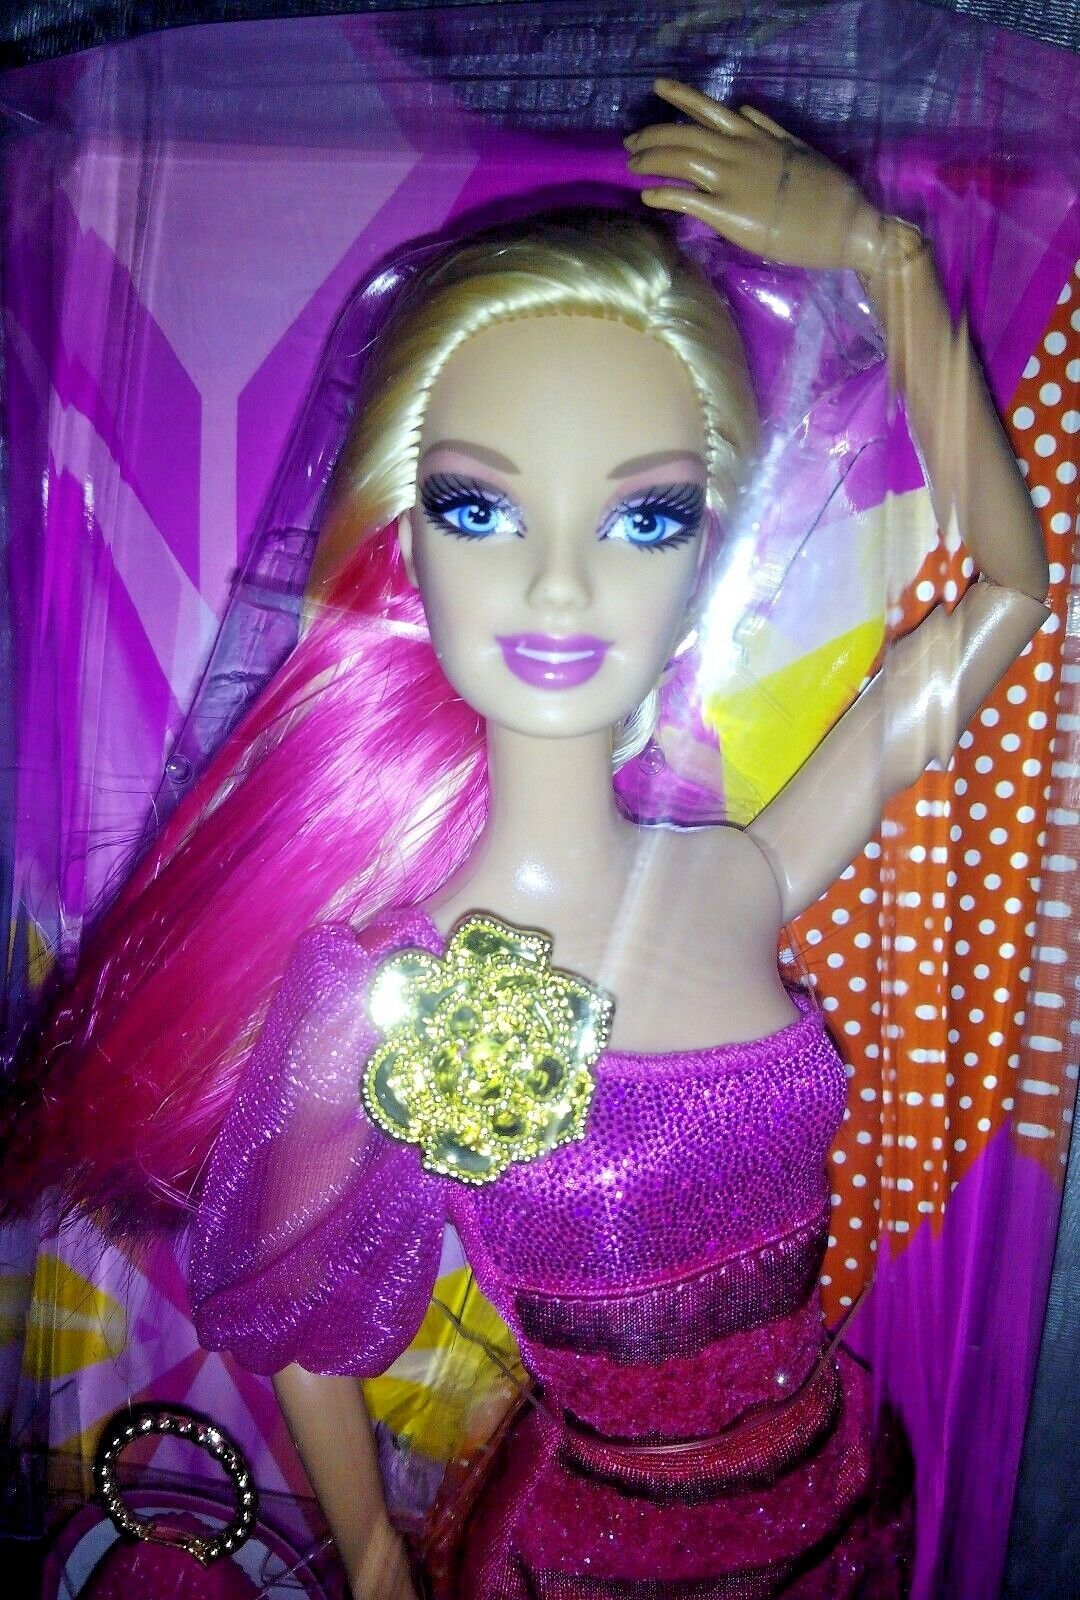 Barbie Fashionista Fashionista Fashionista articulada Rainbow wave 1 MODELO GLAM 2248f4